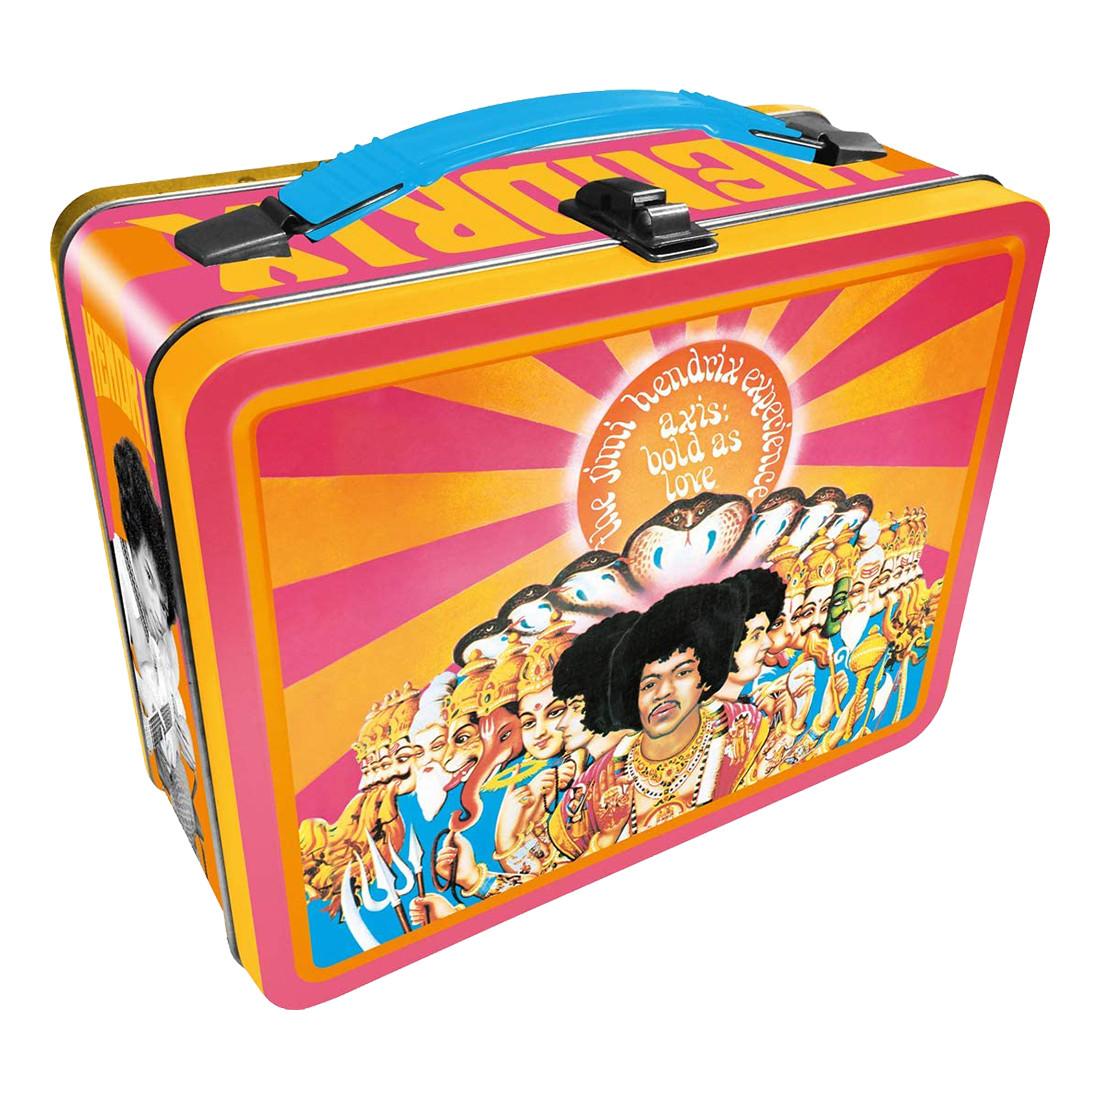 Jimi Hendrix Lunch Box